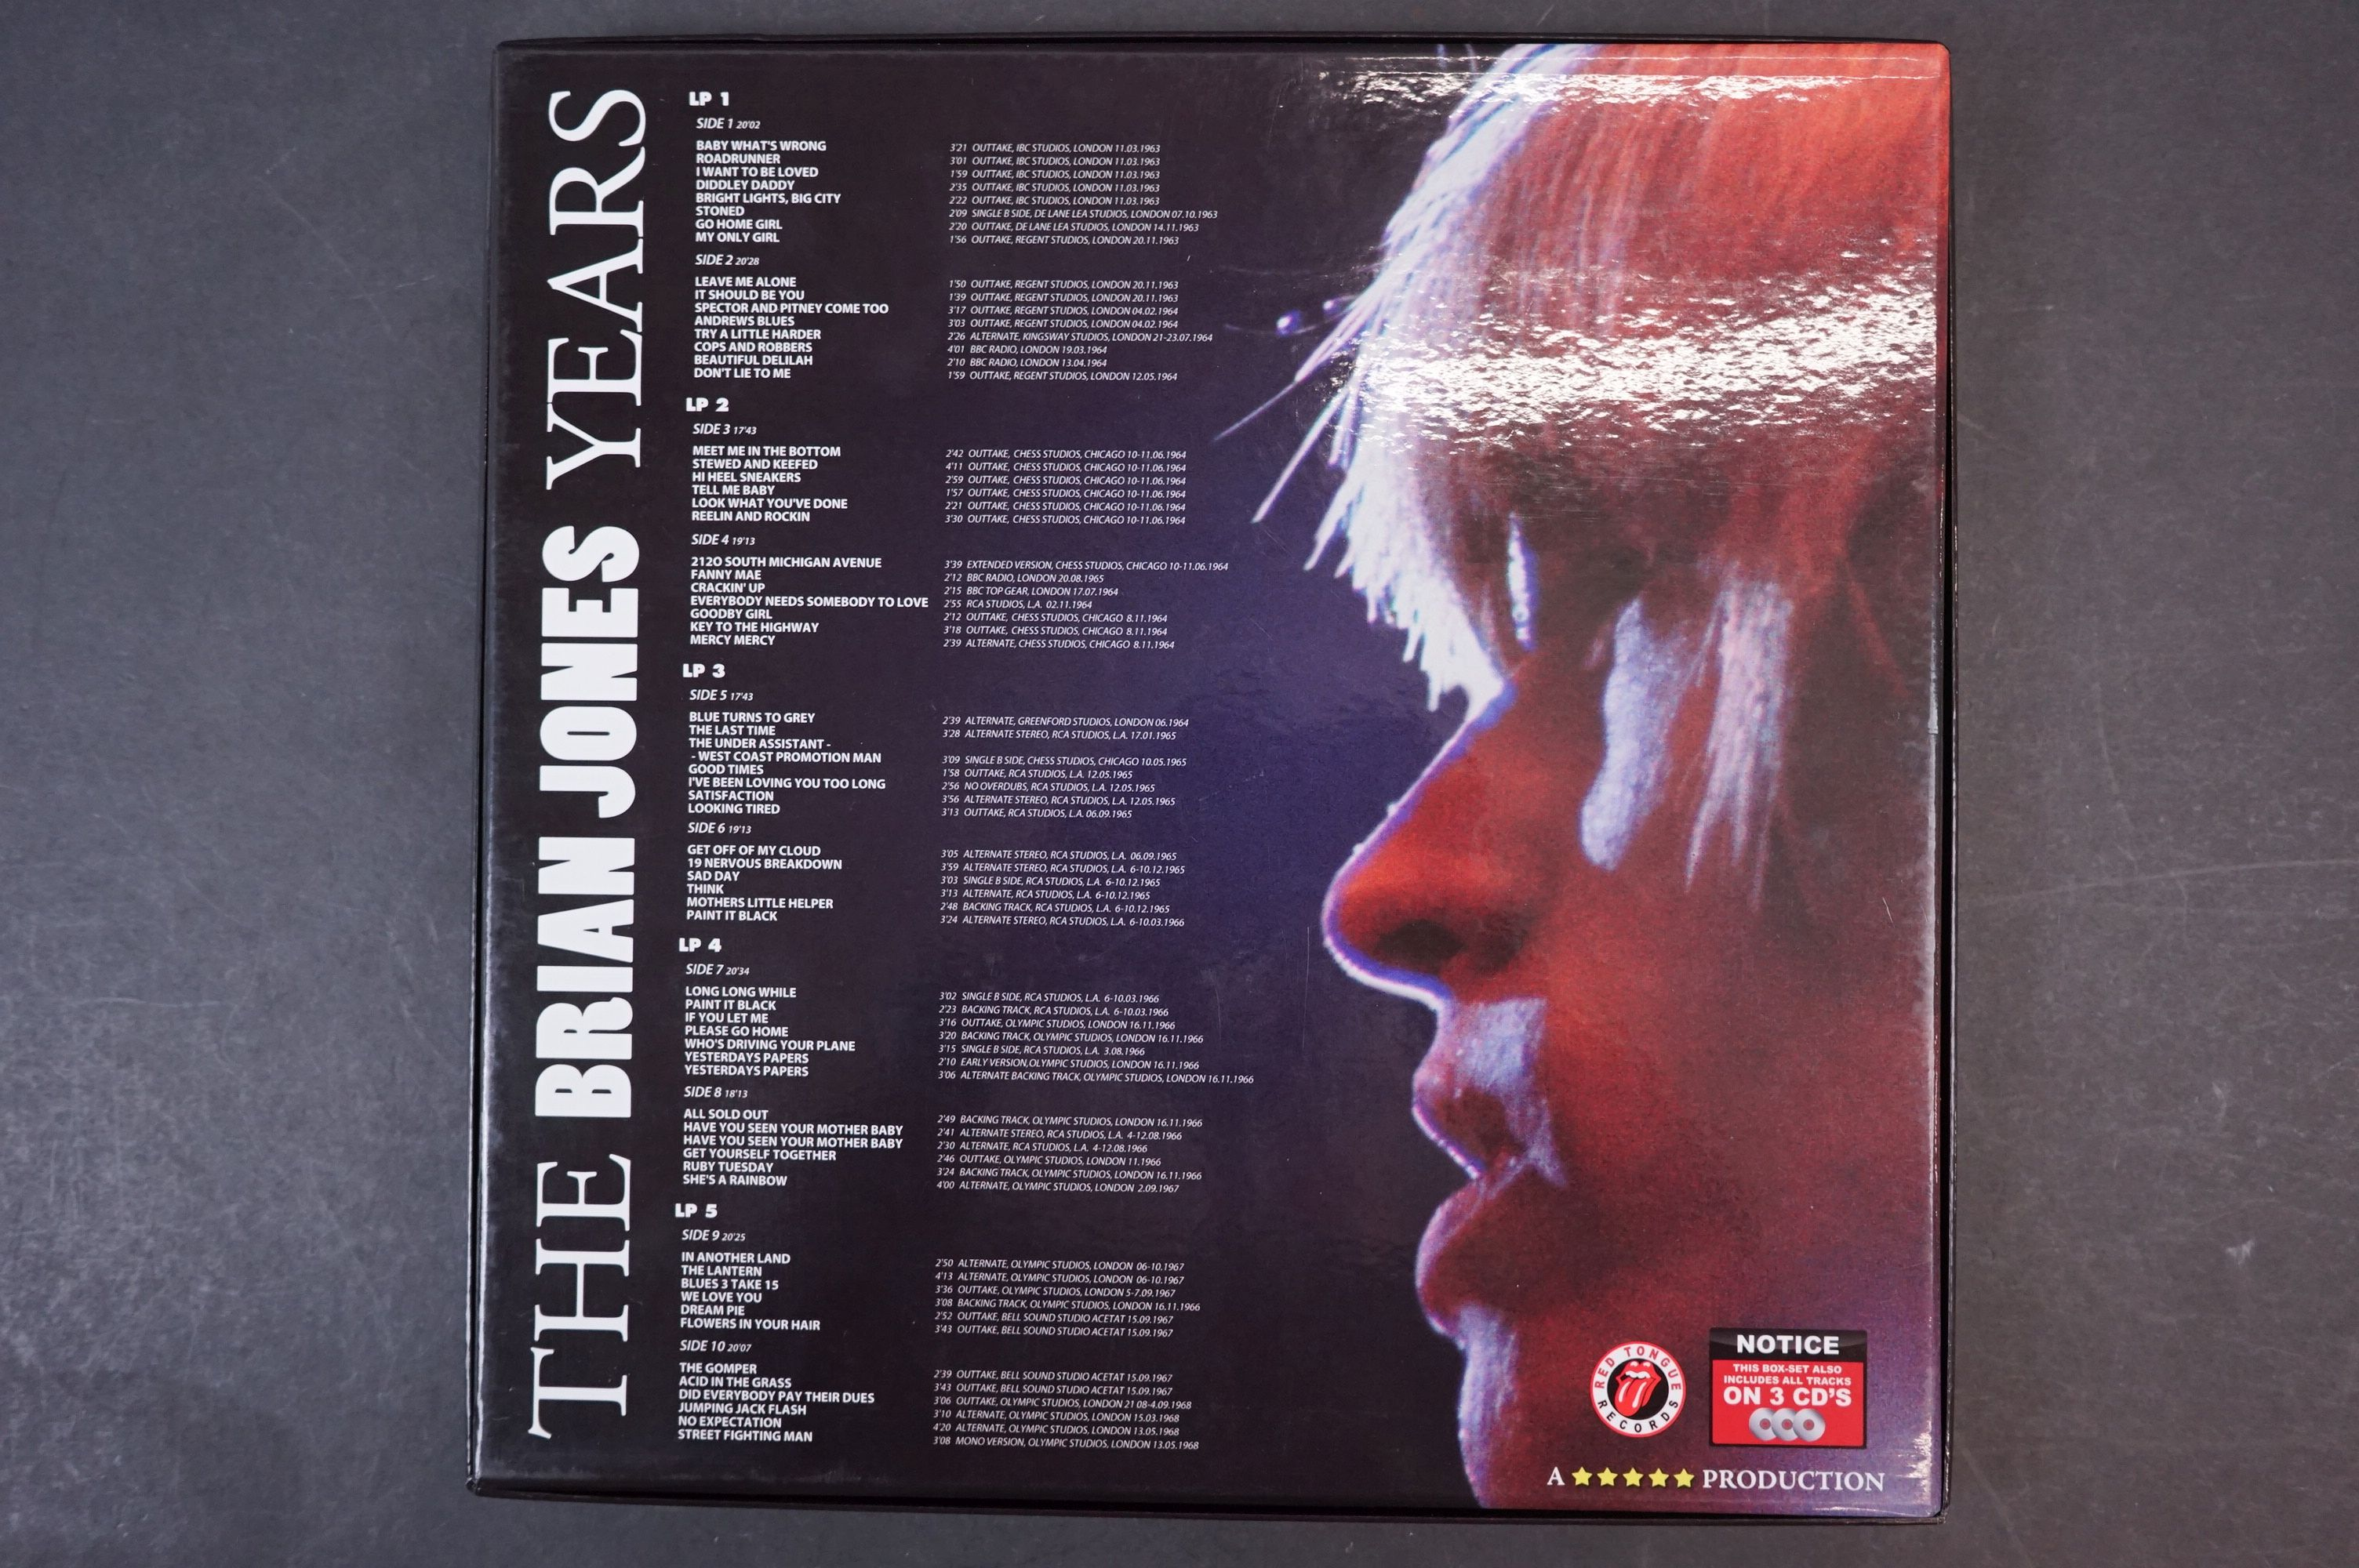 Vinyl - ltd edn The Rolling Stones The Brian Jones Years 5 LP / 3 CD Box Set RTR019, heavy - Image 10 of 12